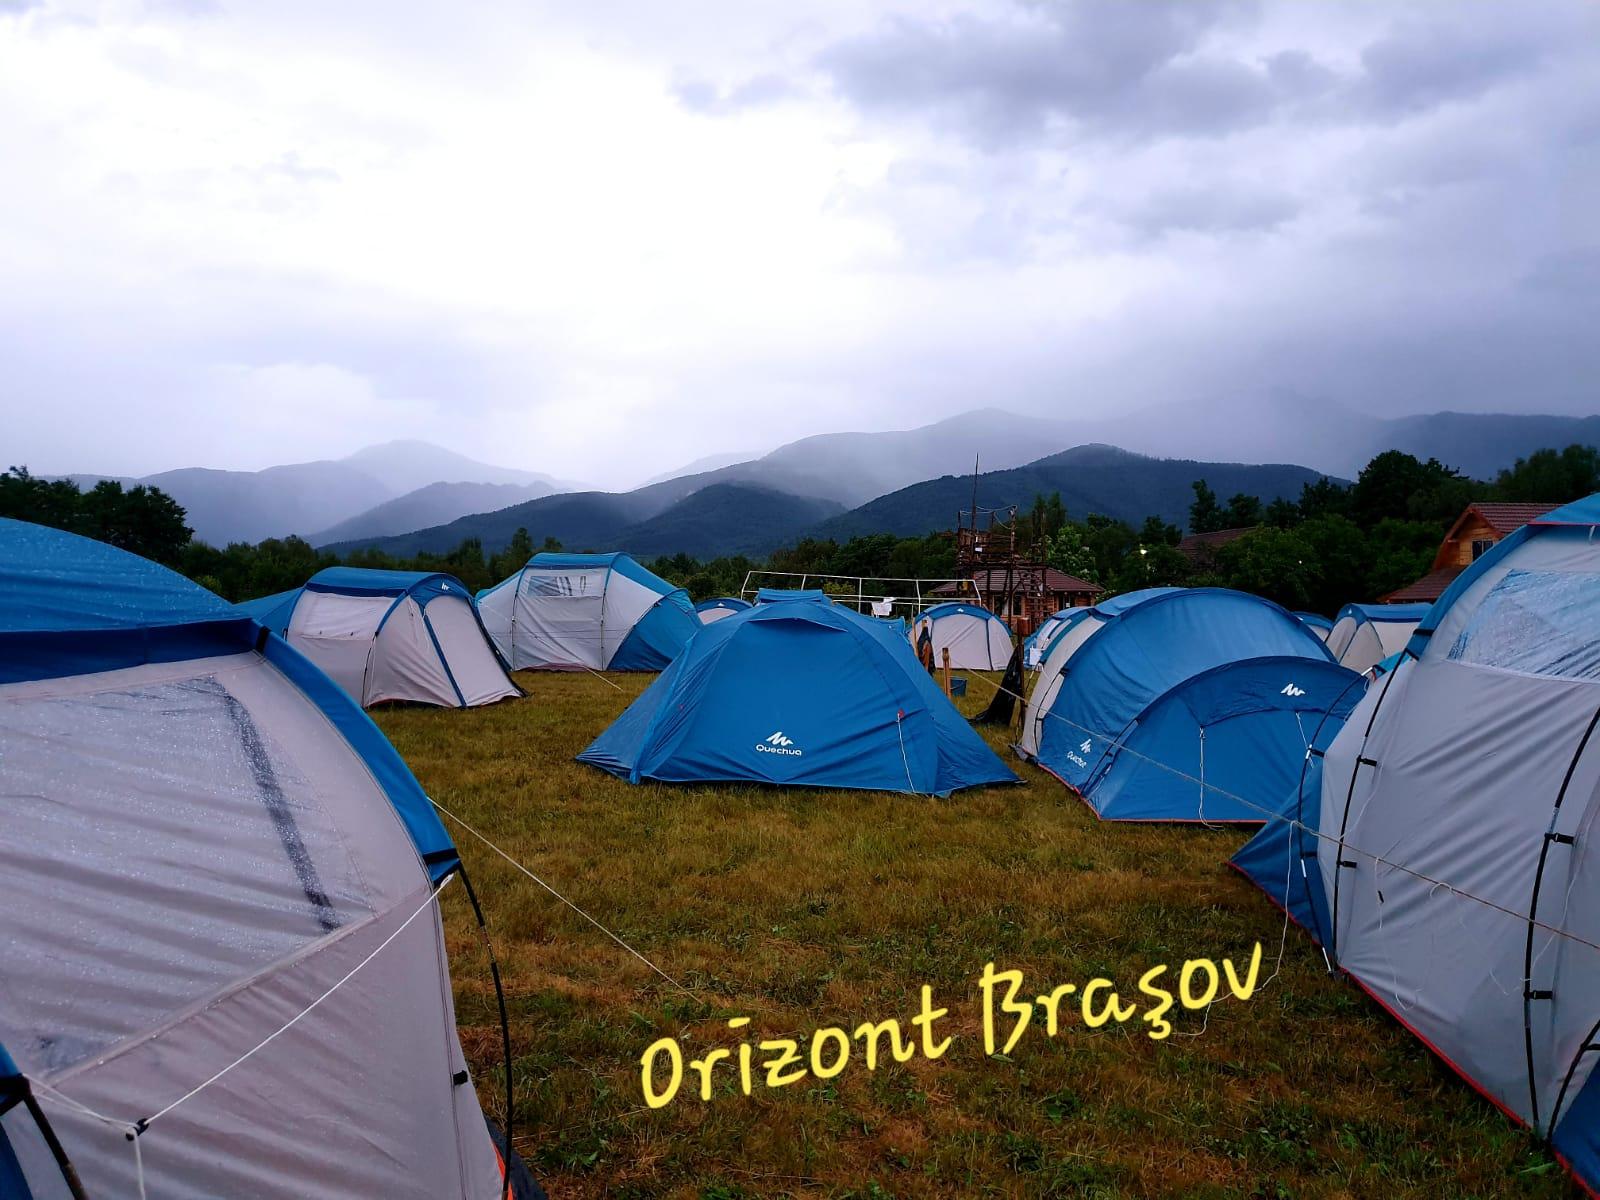 corturi Orizont Bv